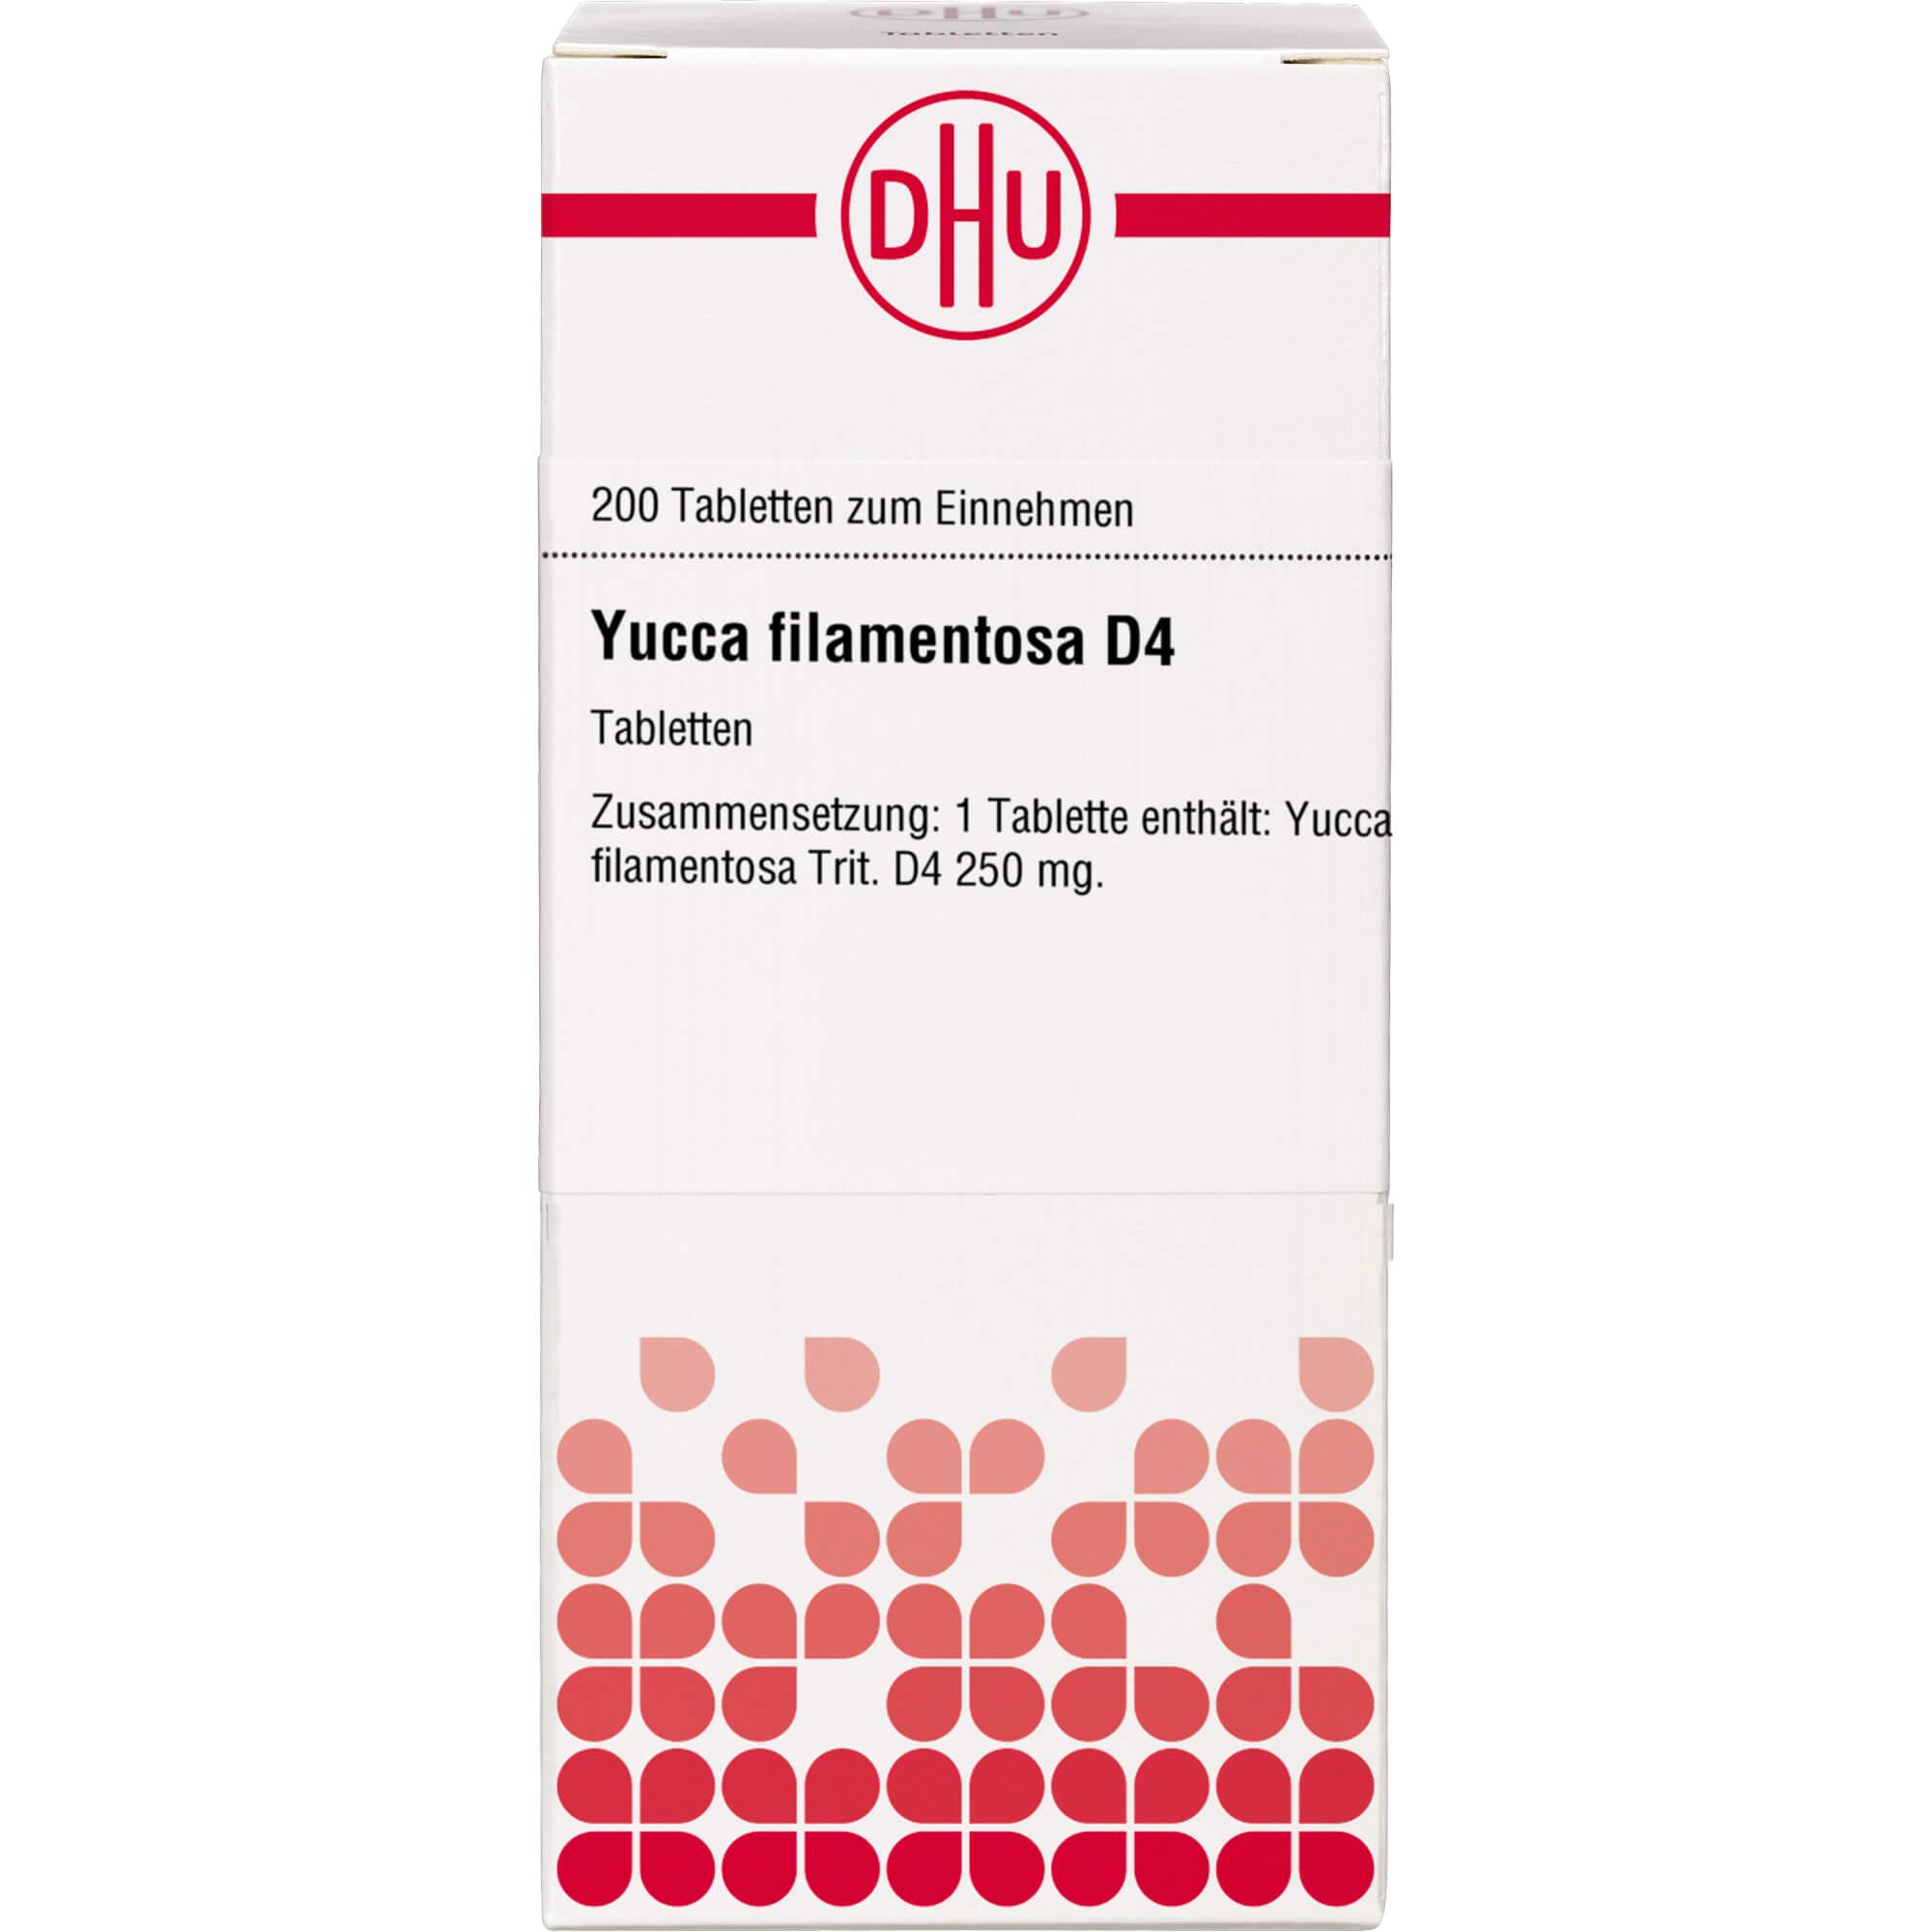 YUCCA FILAMENTOSA D 4 Tabletten